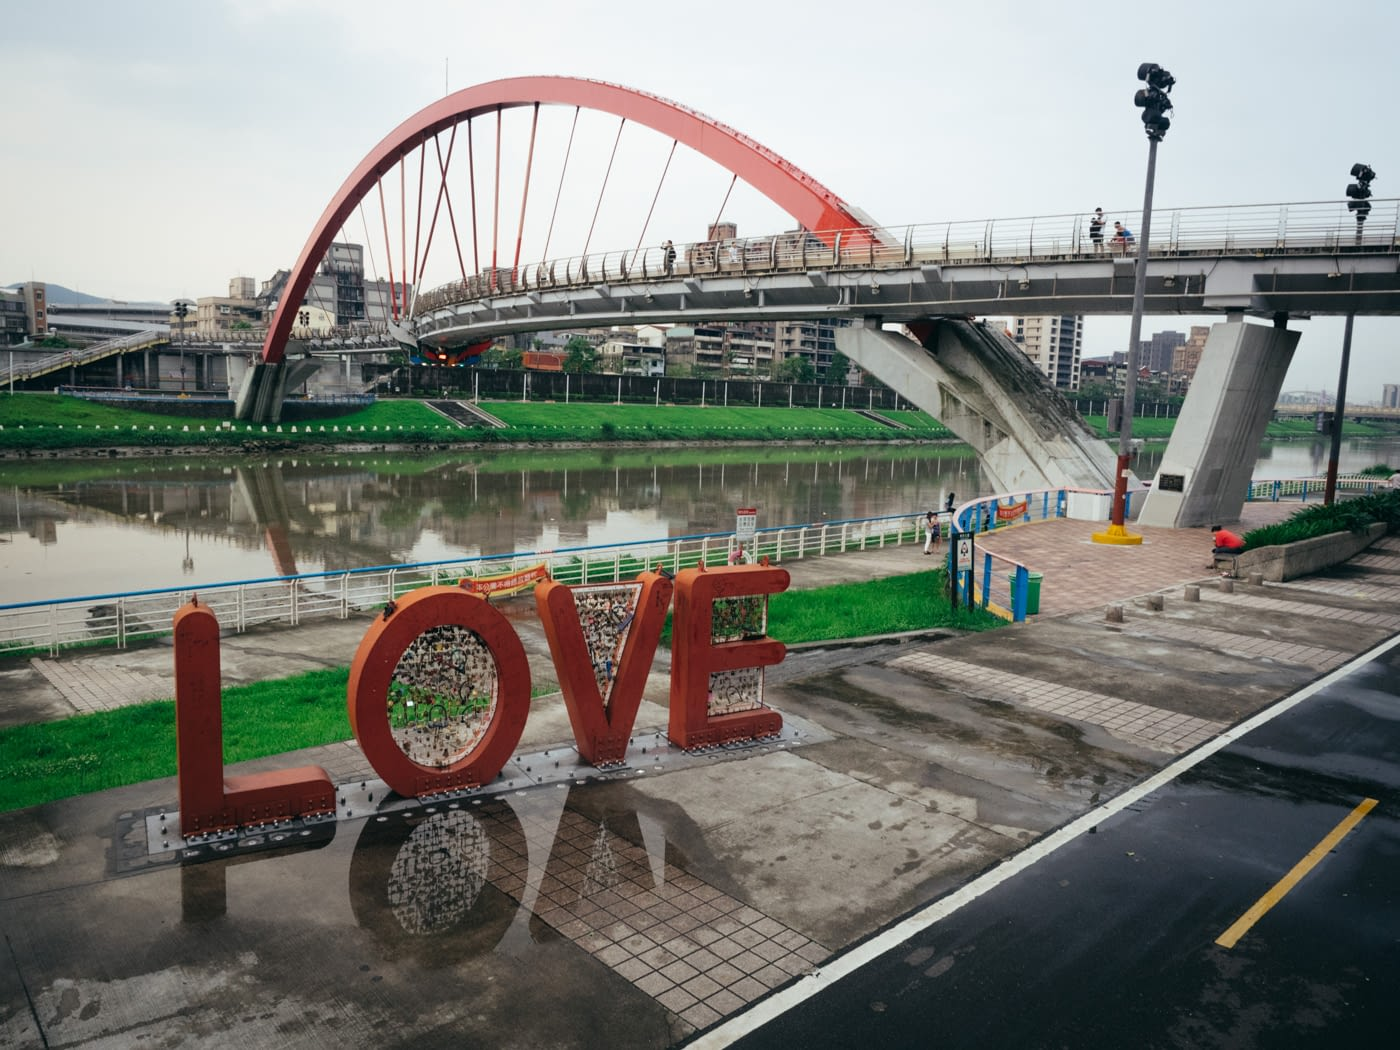 Taiwan - Shifen - Rainbow bridge and Love locks